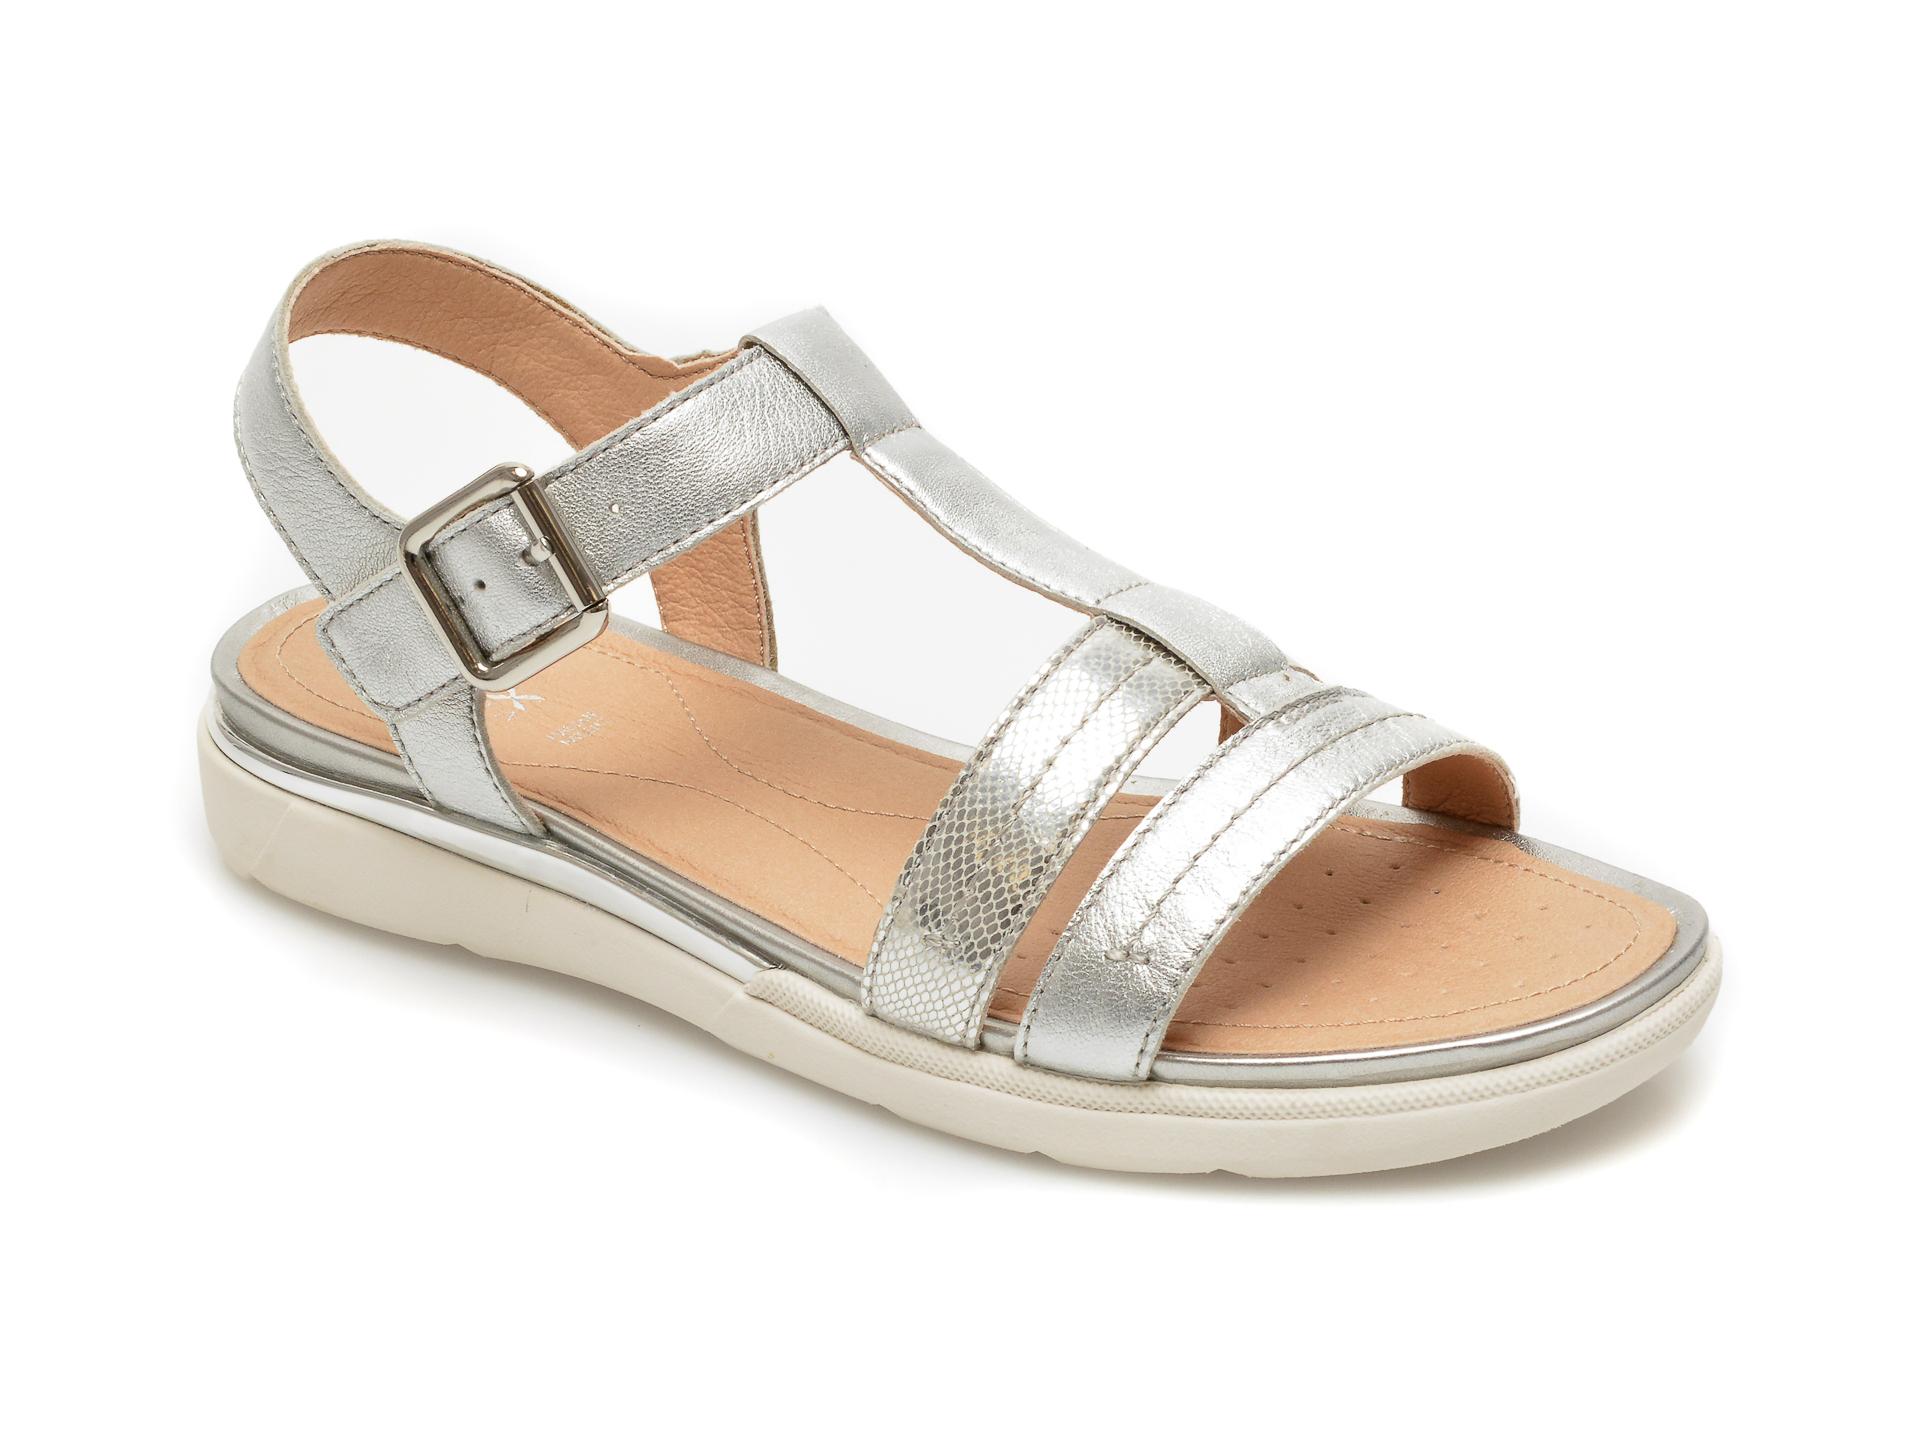 Sandale GEOX argintii, D02GZB, din piele naturala New